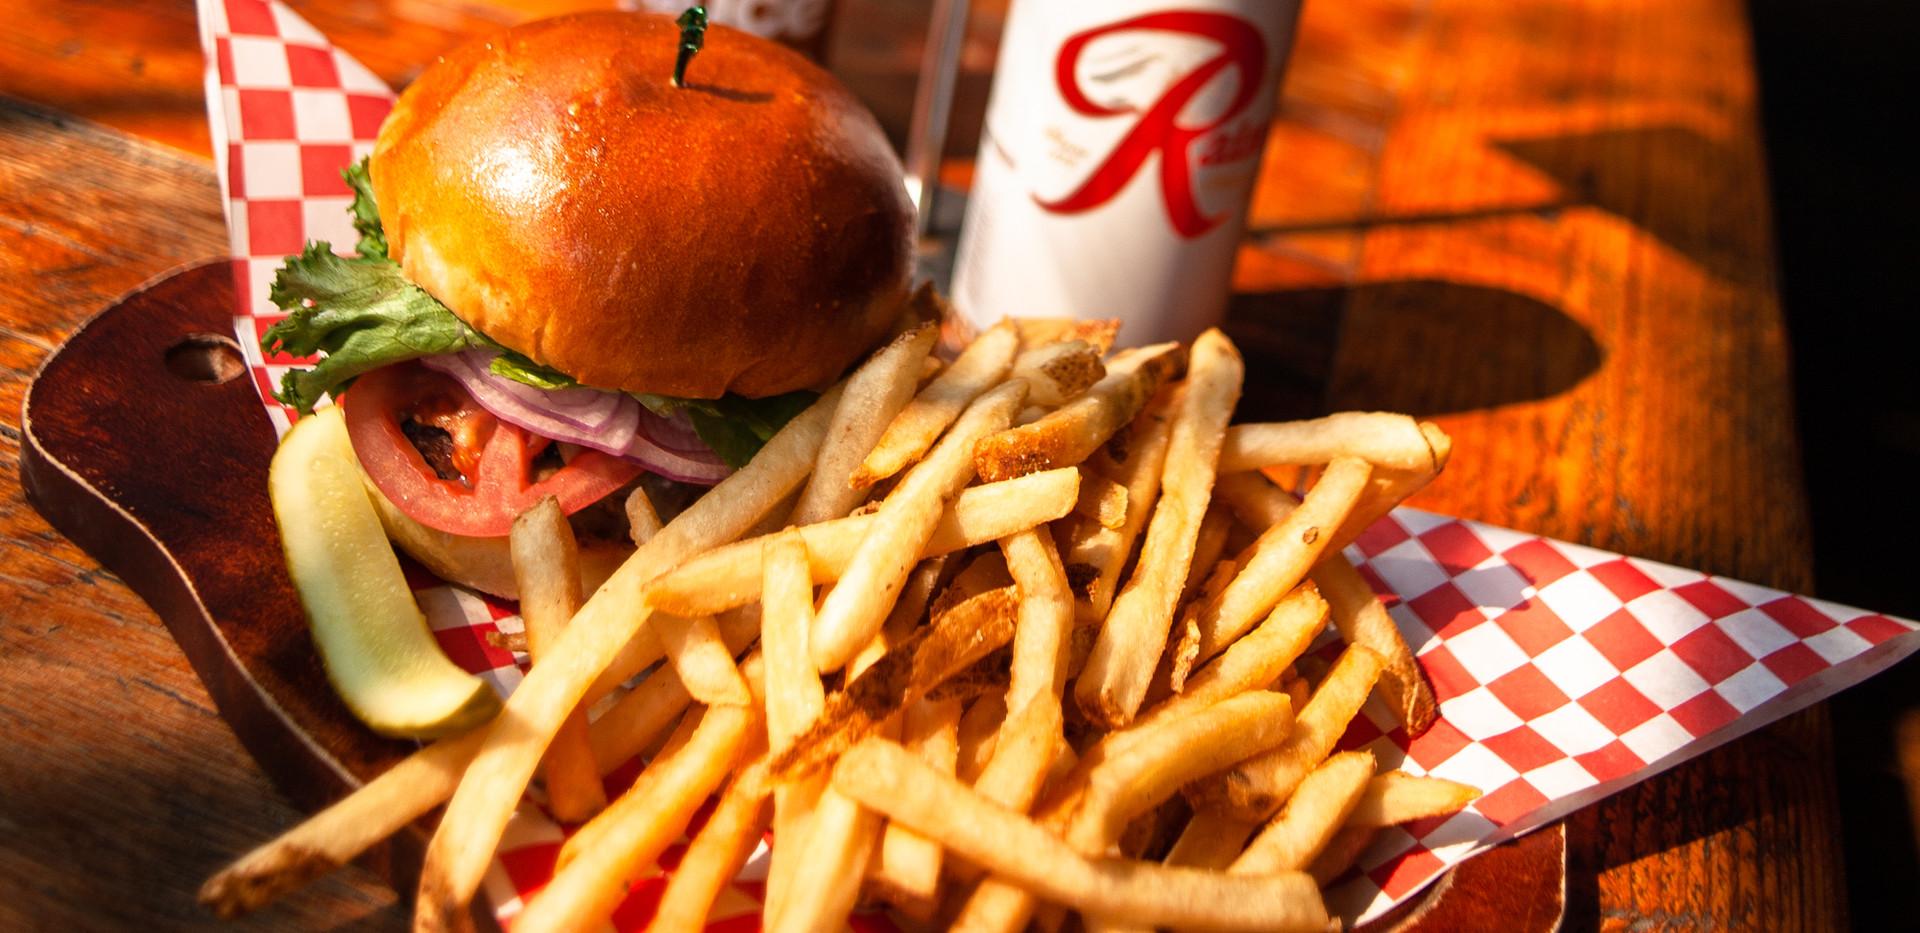 Burger_1 (1 of 1).jpg